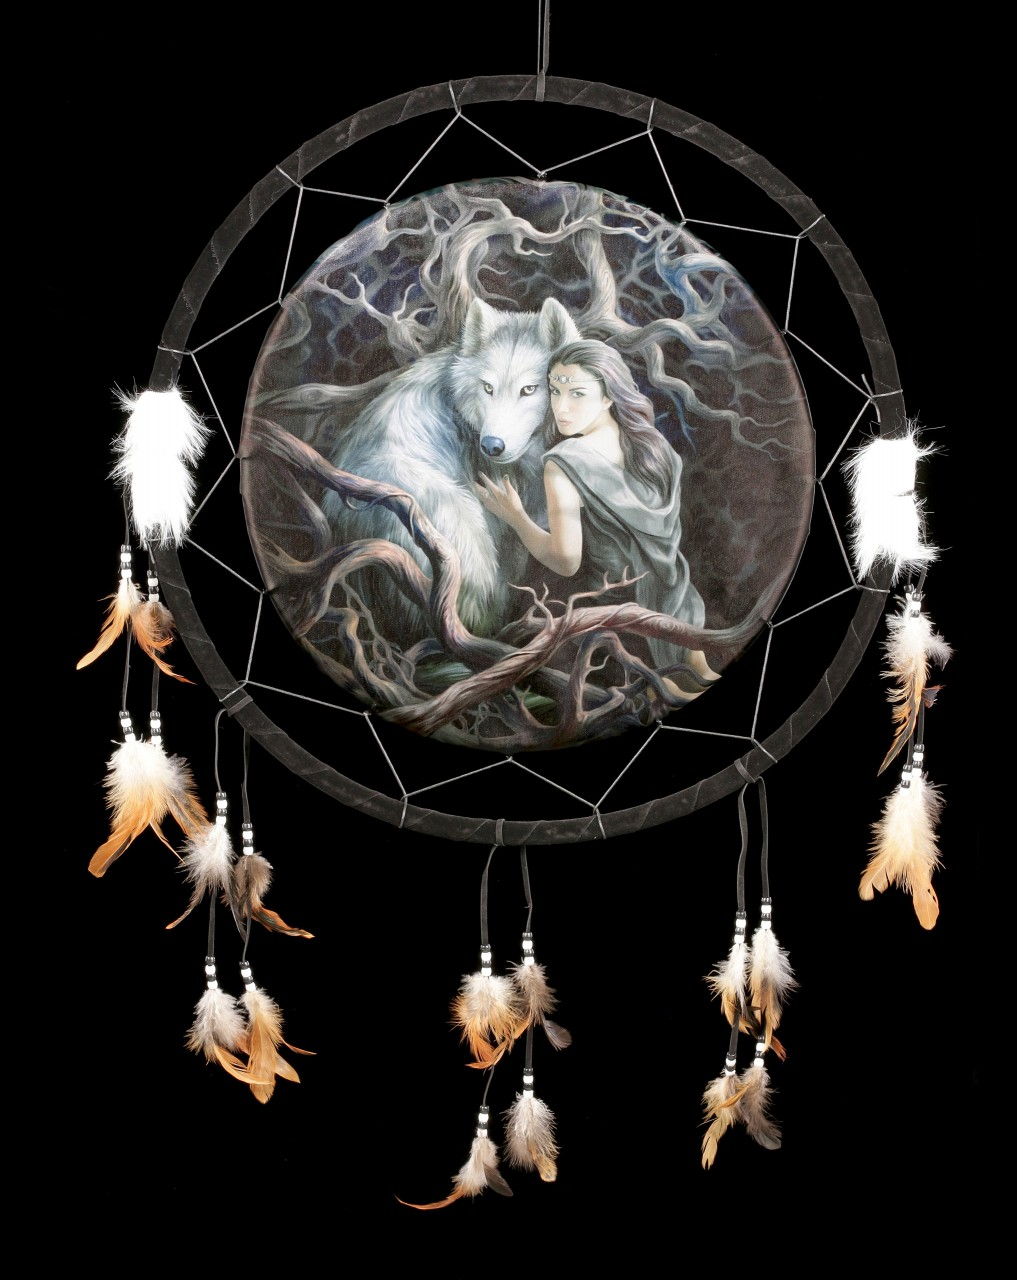 Large Dreamcatcher with Wolf - Soul Bond